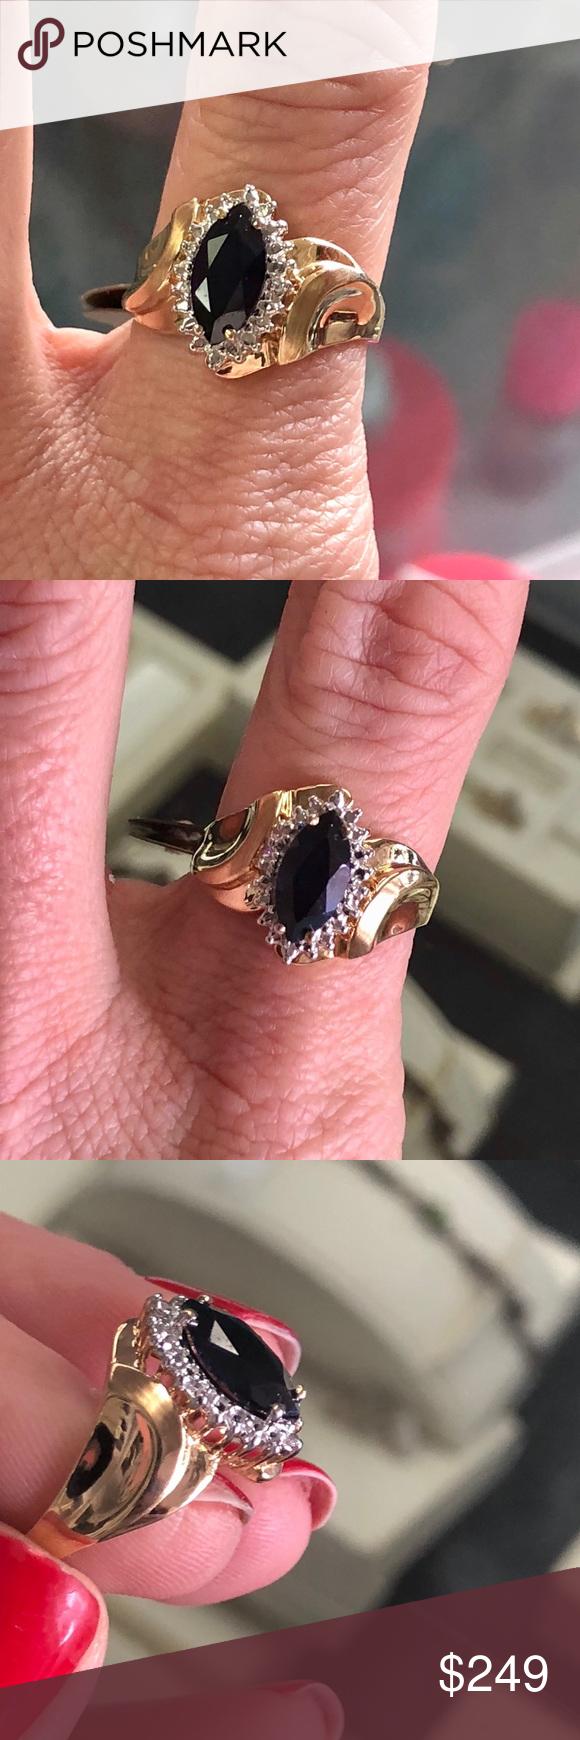 10k emerald ring | My Posh Picks | Pinterest | Emeralds, Ring and ...